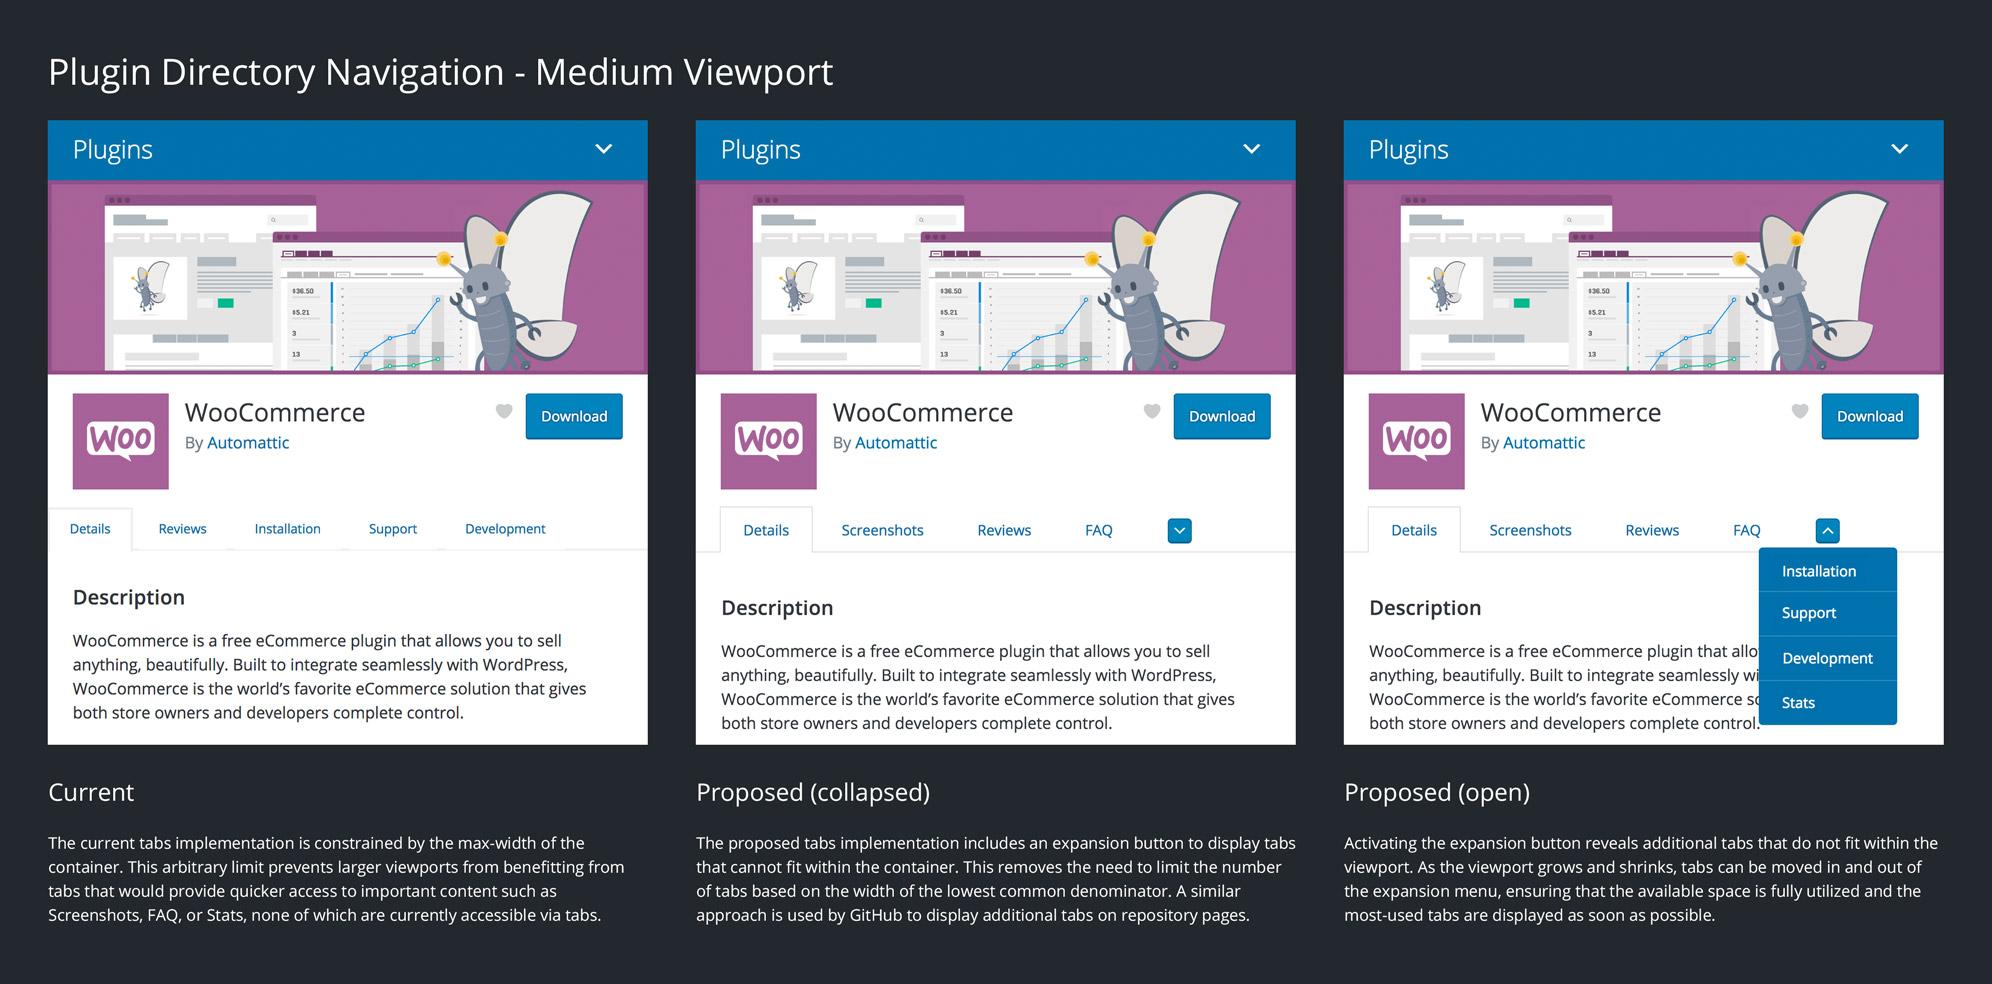 2776 (Plugin Directory: Improve responsive design of tabs